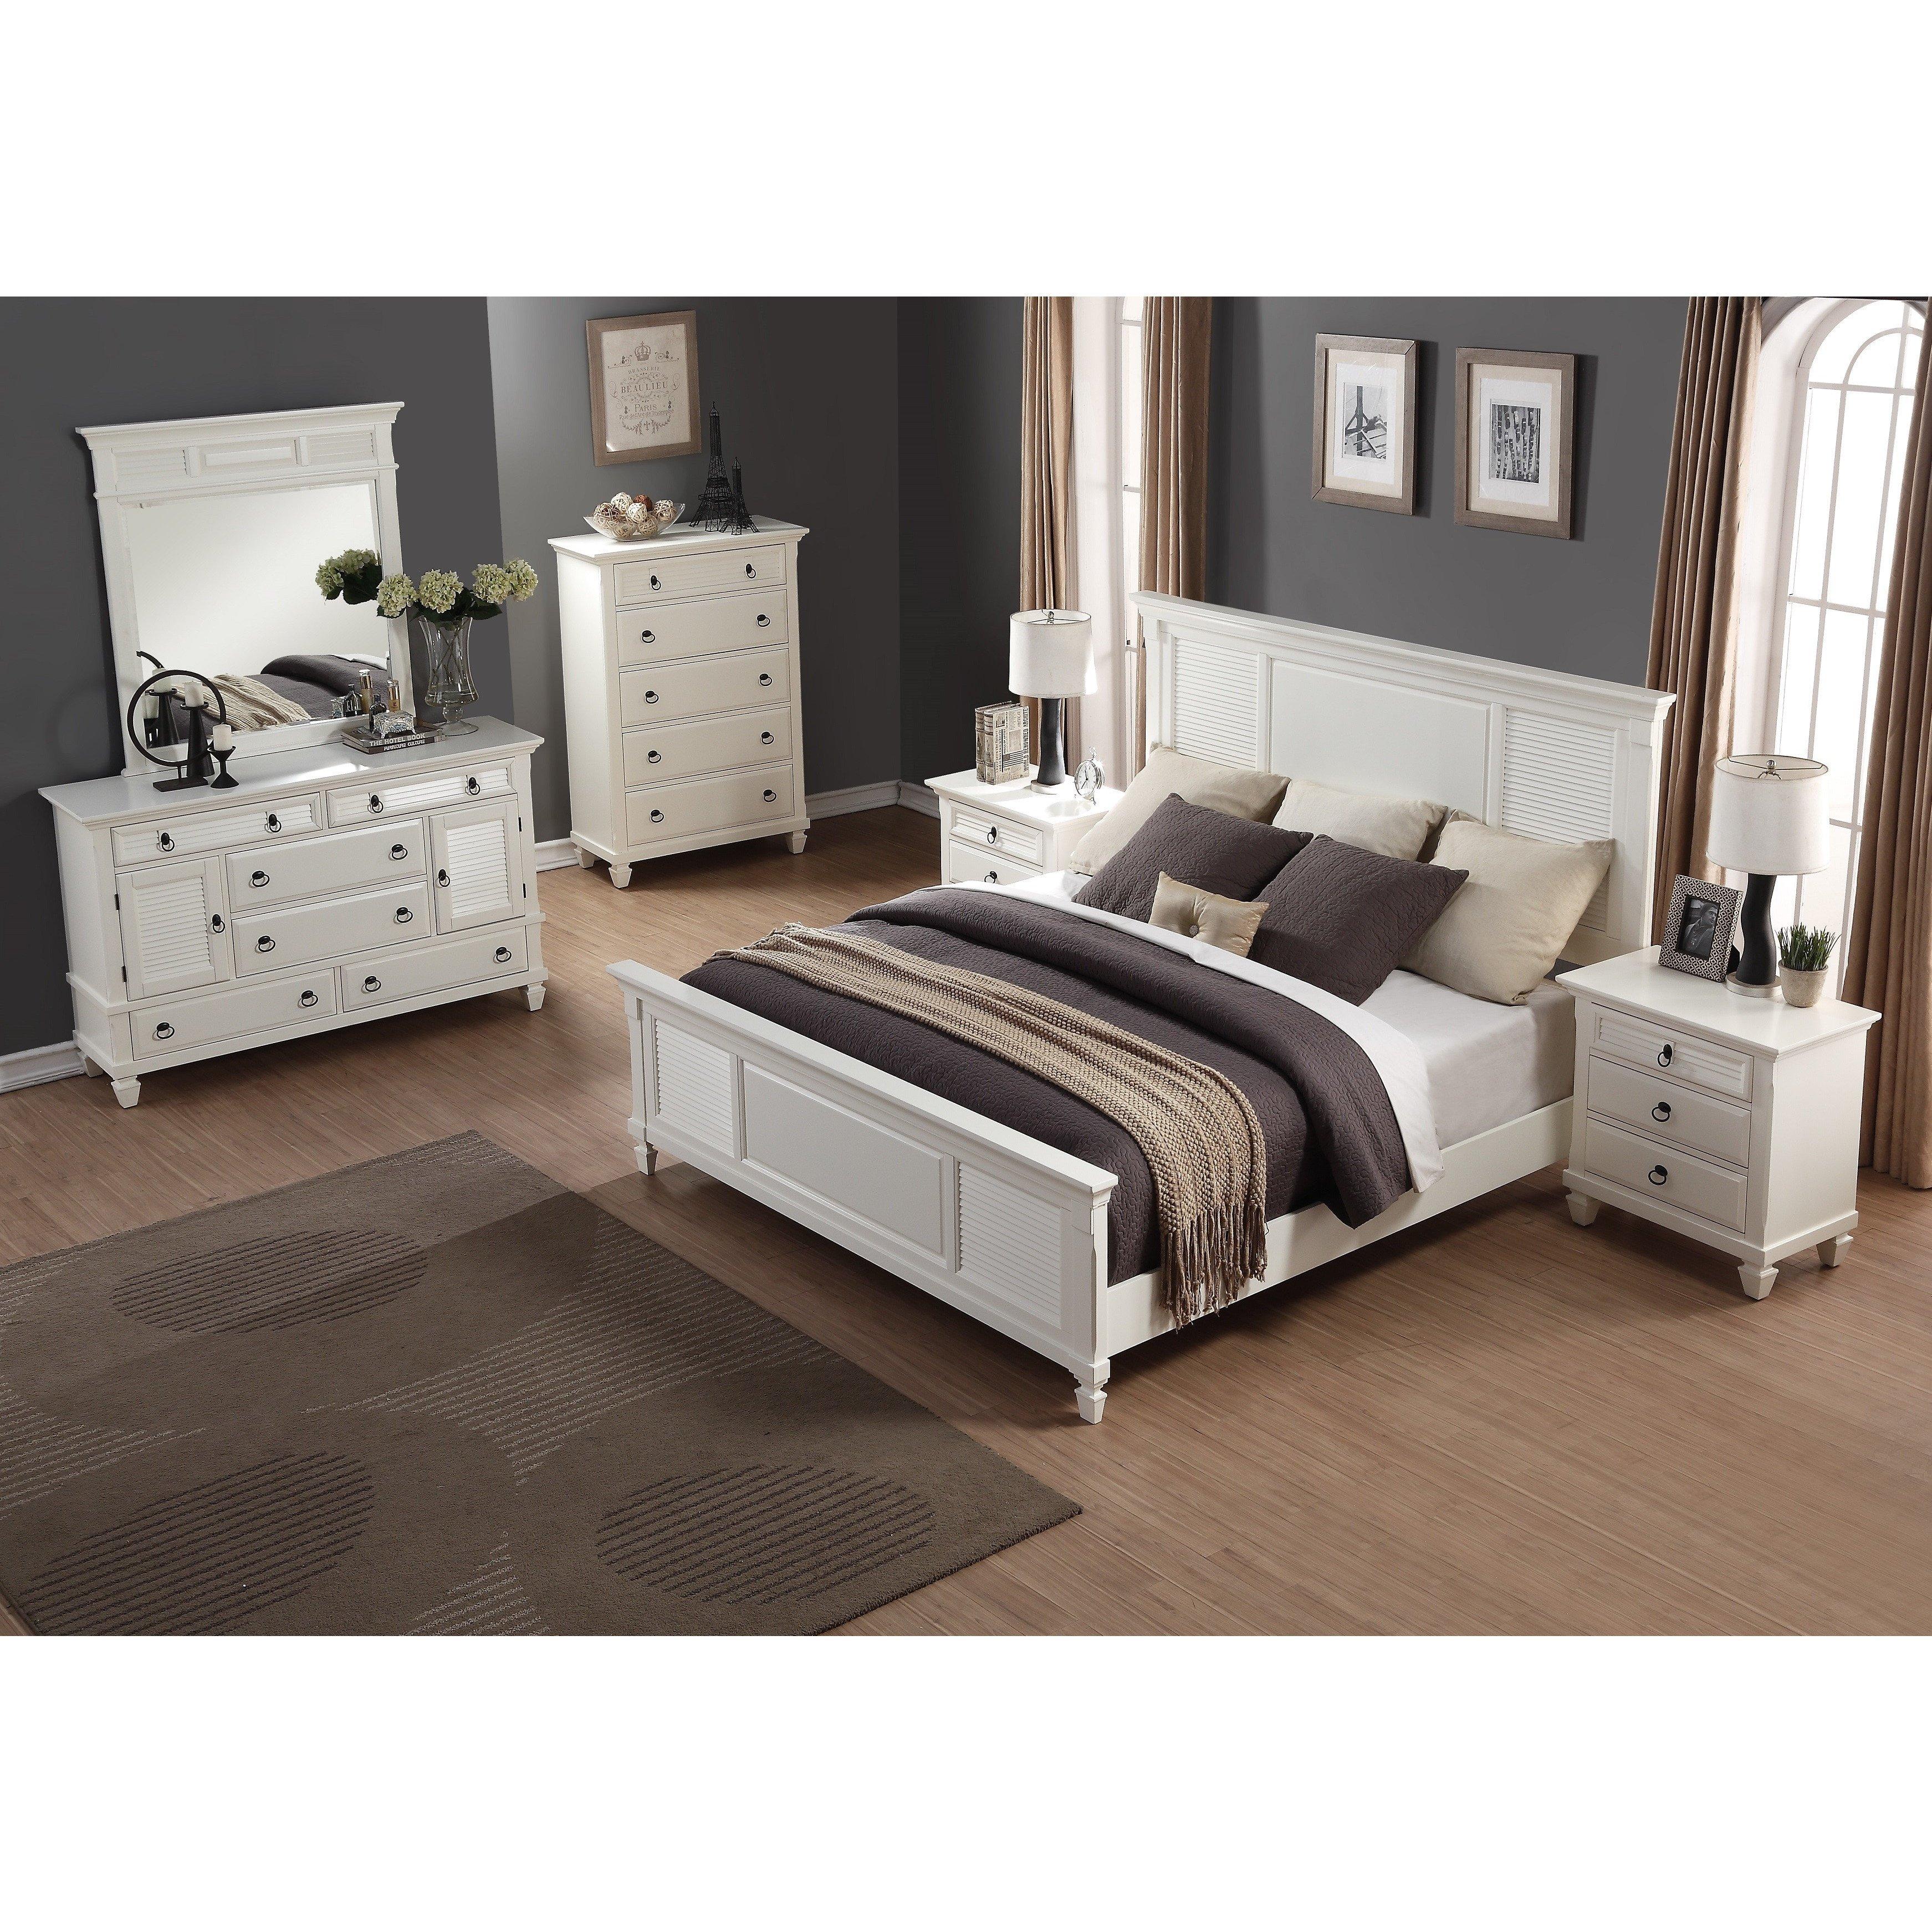 Mirror Bedroom Furniture Set Elegant Regitina White 6 Piece Queen Size Bedroom Furniture Set